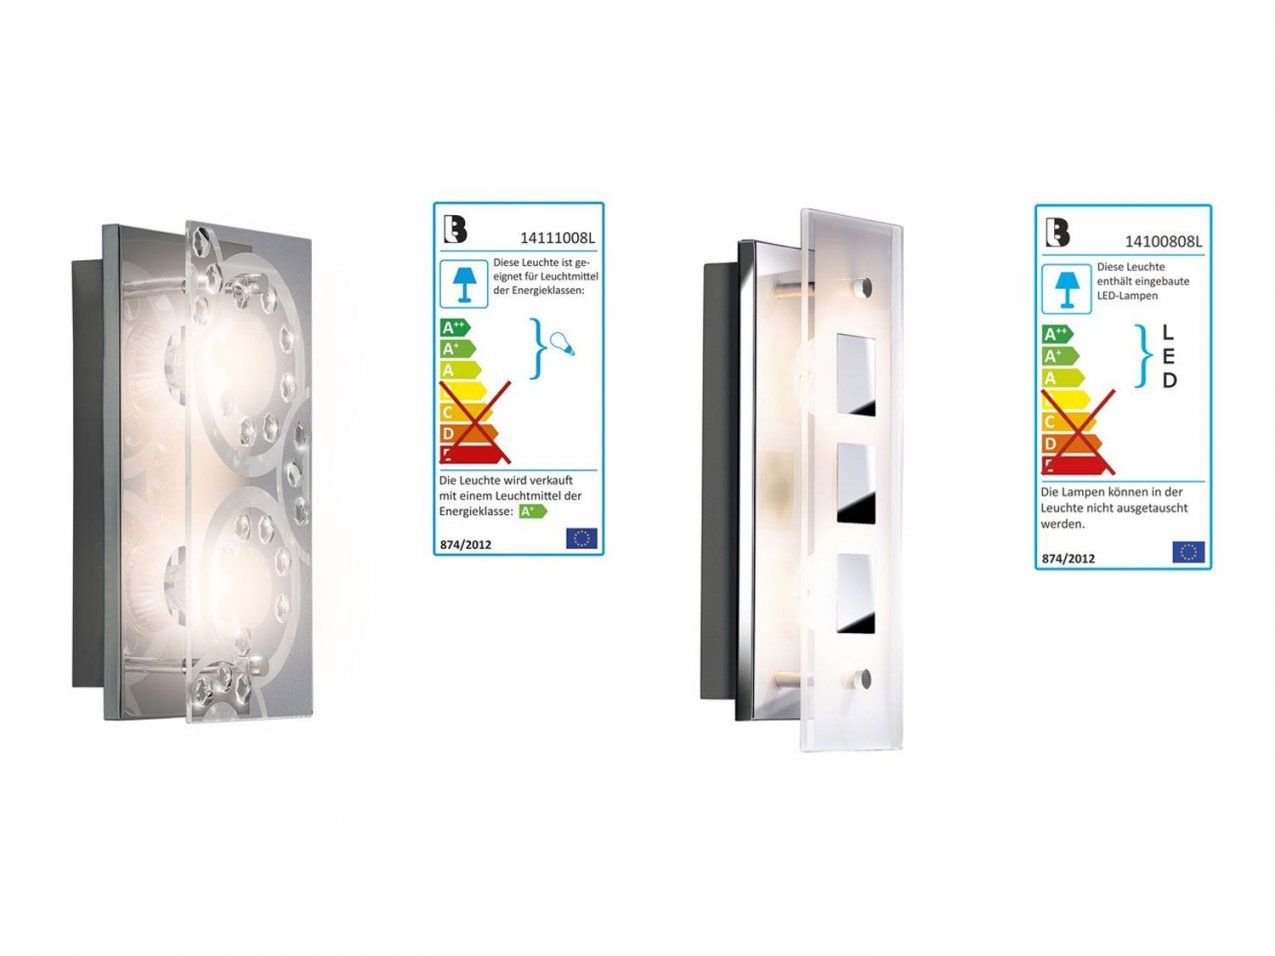 Livarno Lux® Ledwanddeckenleuchte  Lidl Deutschland  Lidl von Livarno Lux Led Wand Deckenleuchte Photo